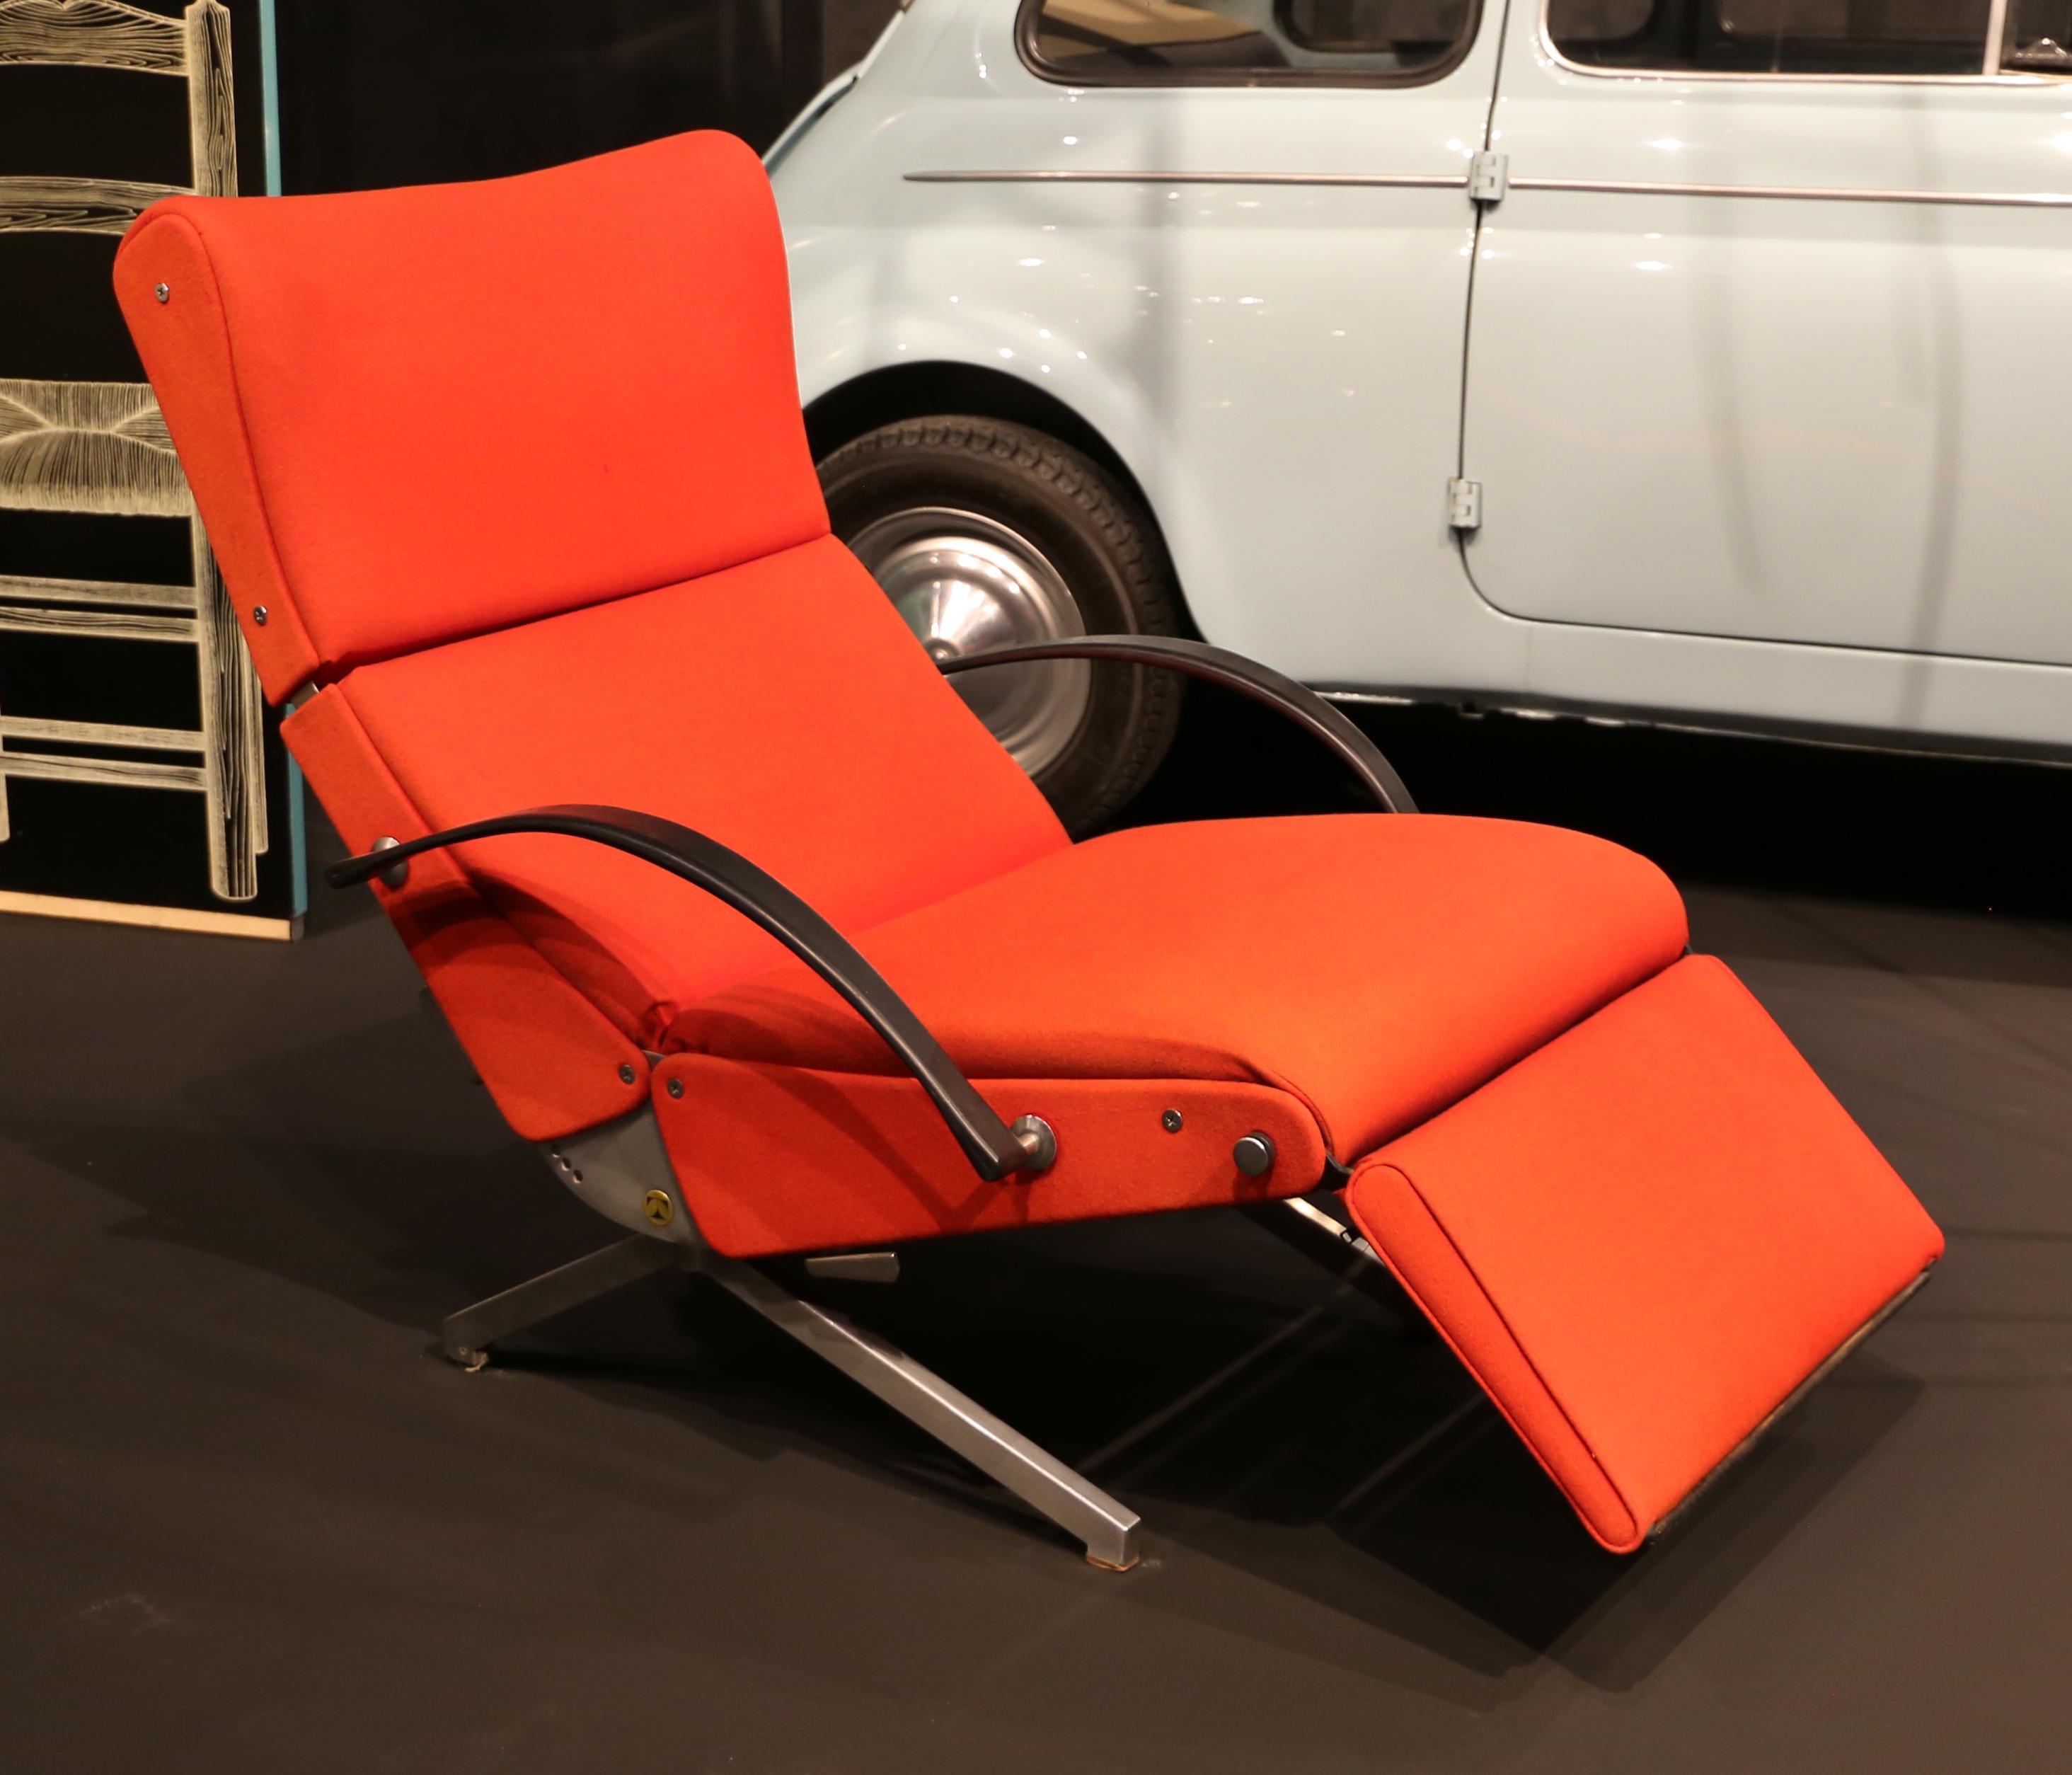 chaiselongue wikipedia File:Osvaldo borsani per tecno, chaise longue p40, 1955.jpg